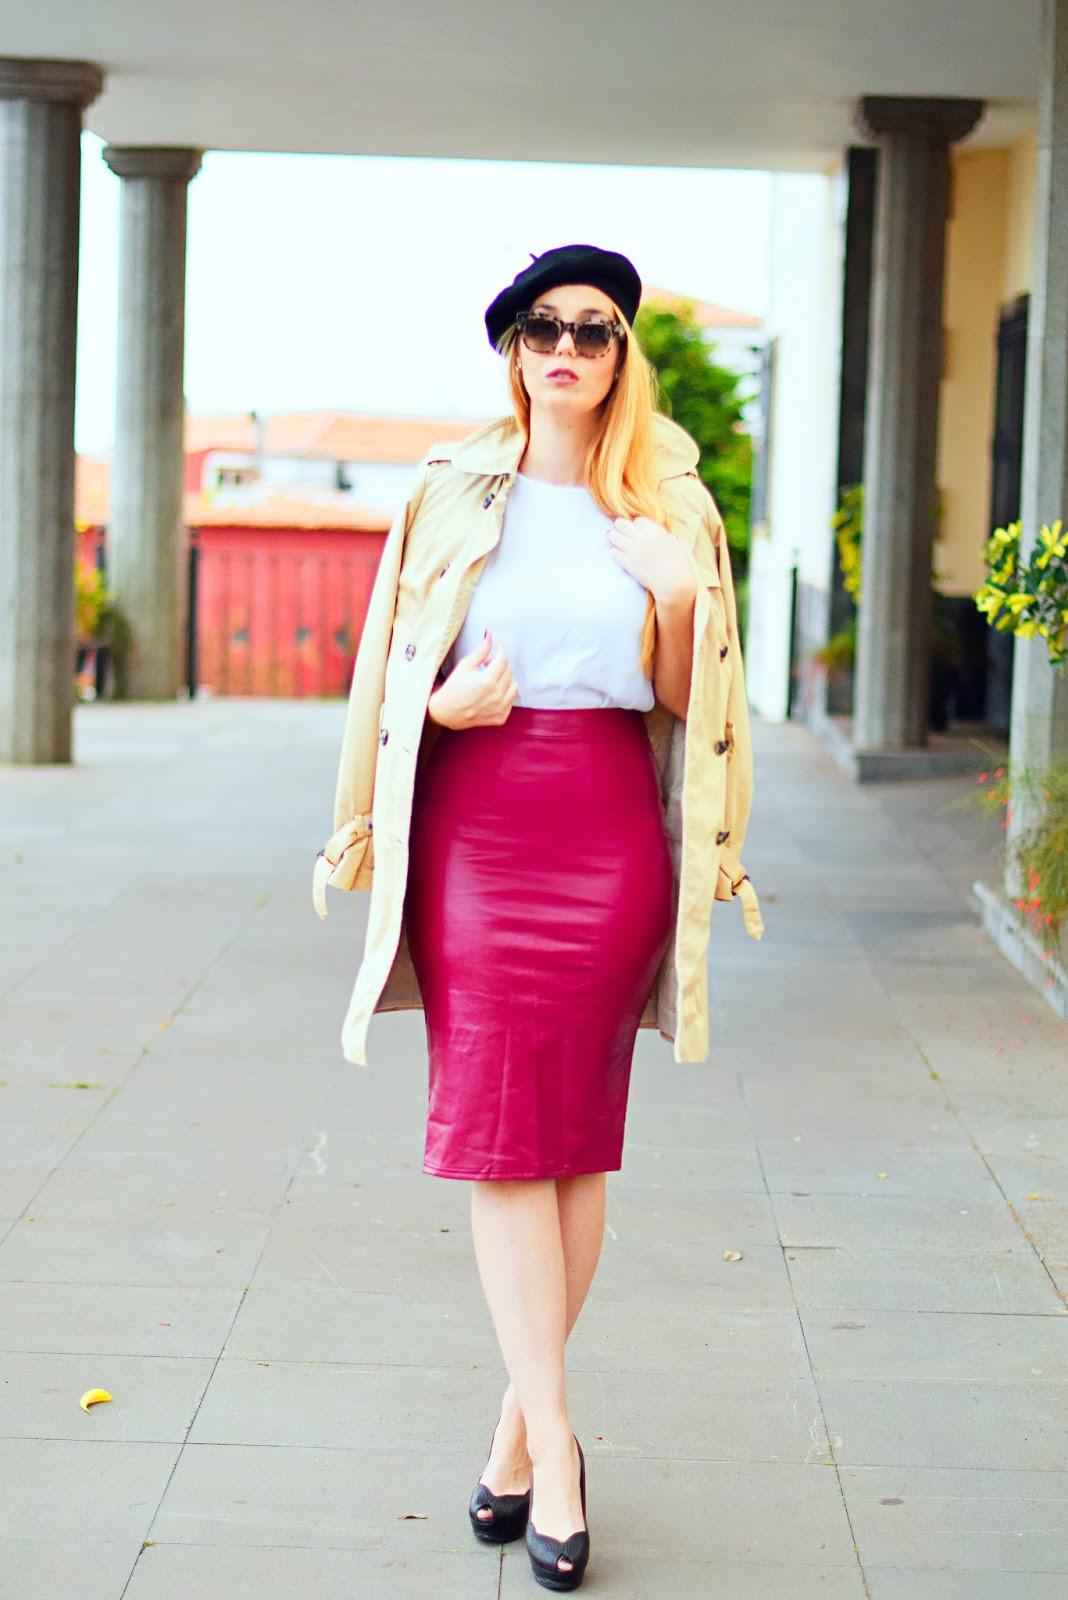 dresslink, celine, opticalh, gafas havana, falda polipiel burdeos, nery hdez , estilo francés,